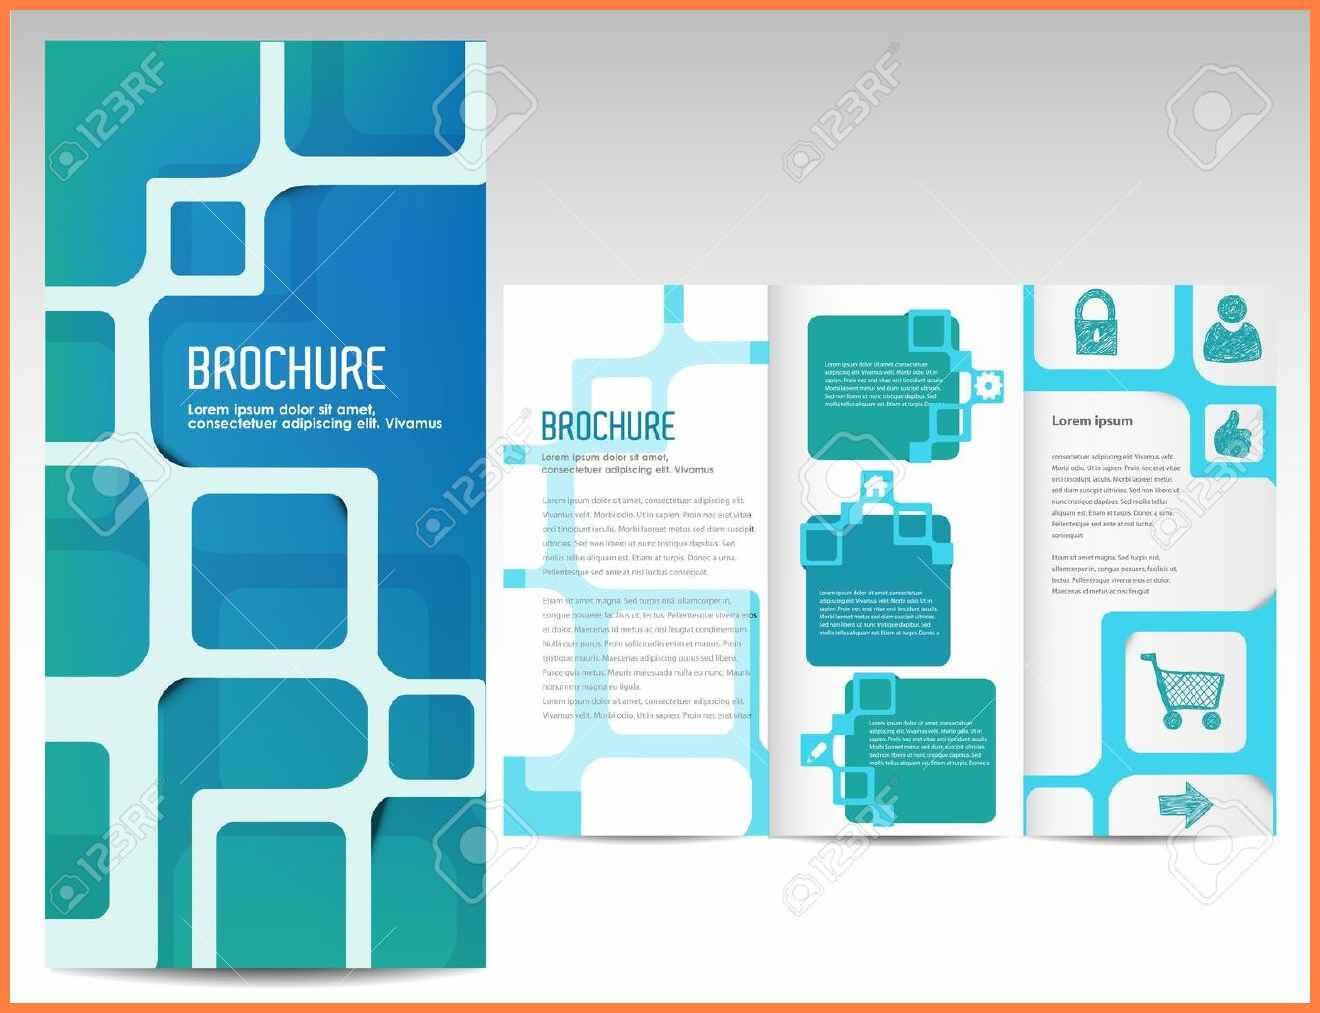 10+ Free Microsoft Word Tri Fold Brochure Templates | Andrew With Free Tri Fold Brochure Templates Microsoft Word